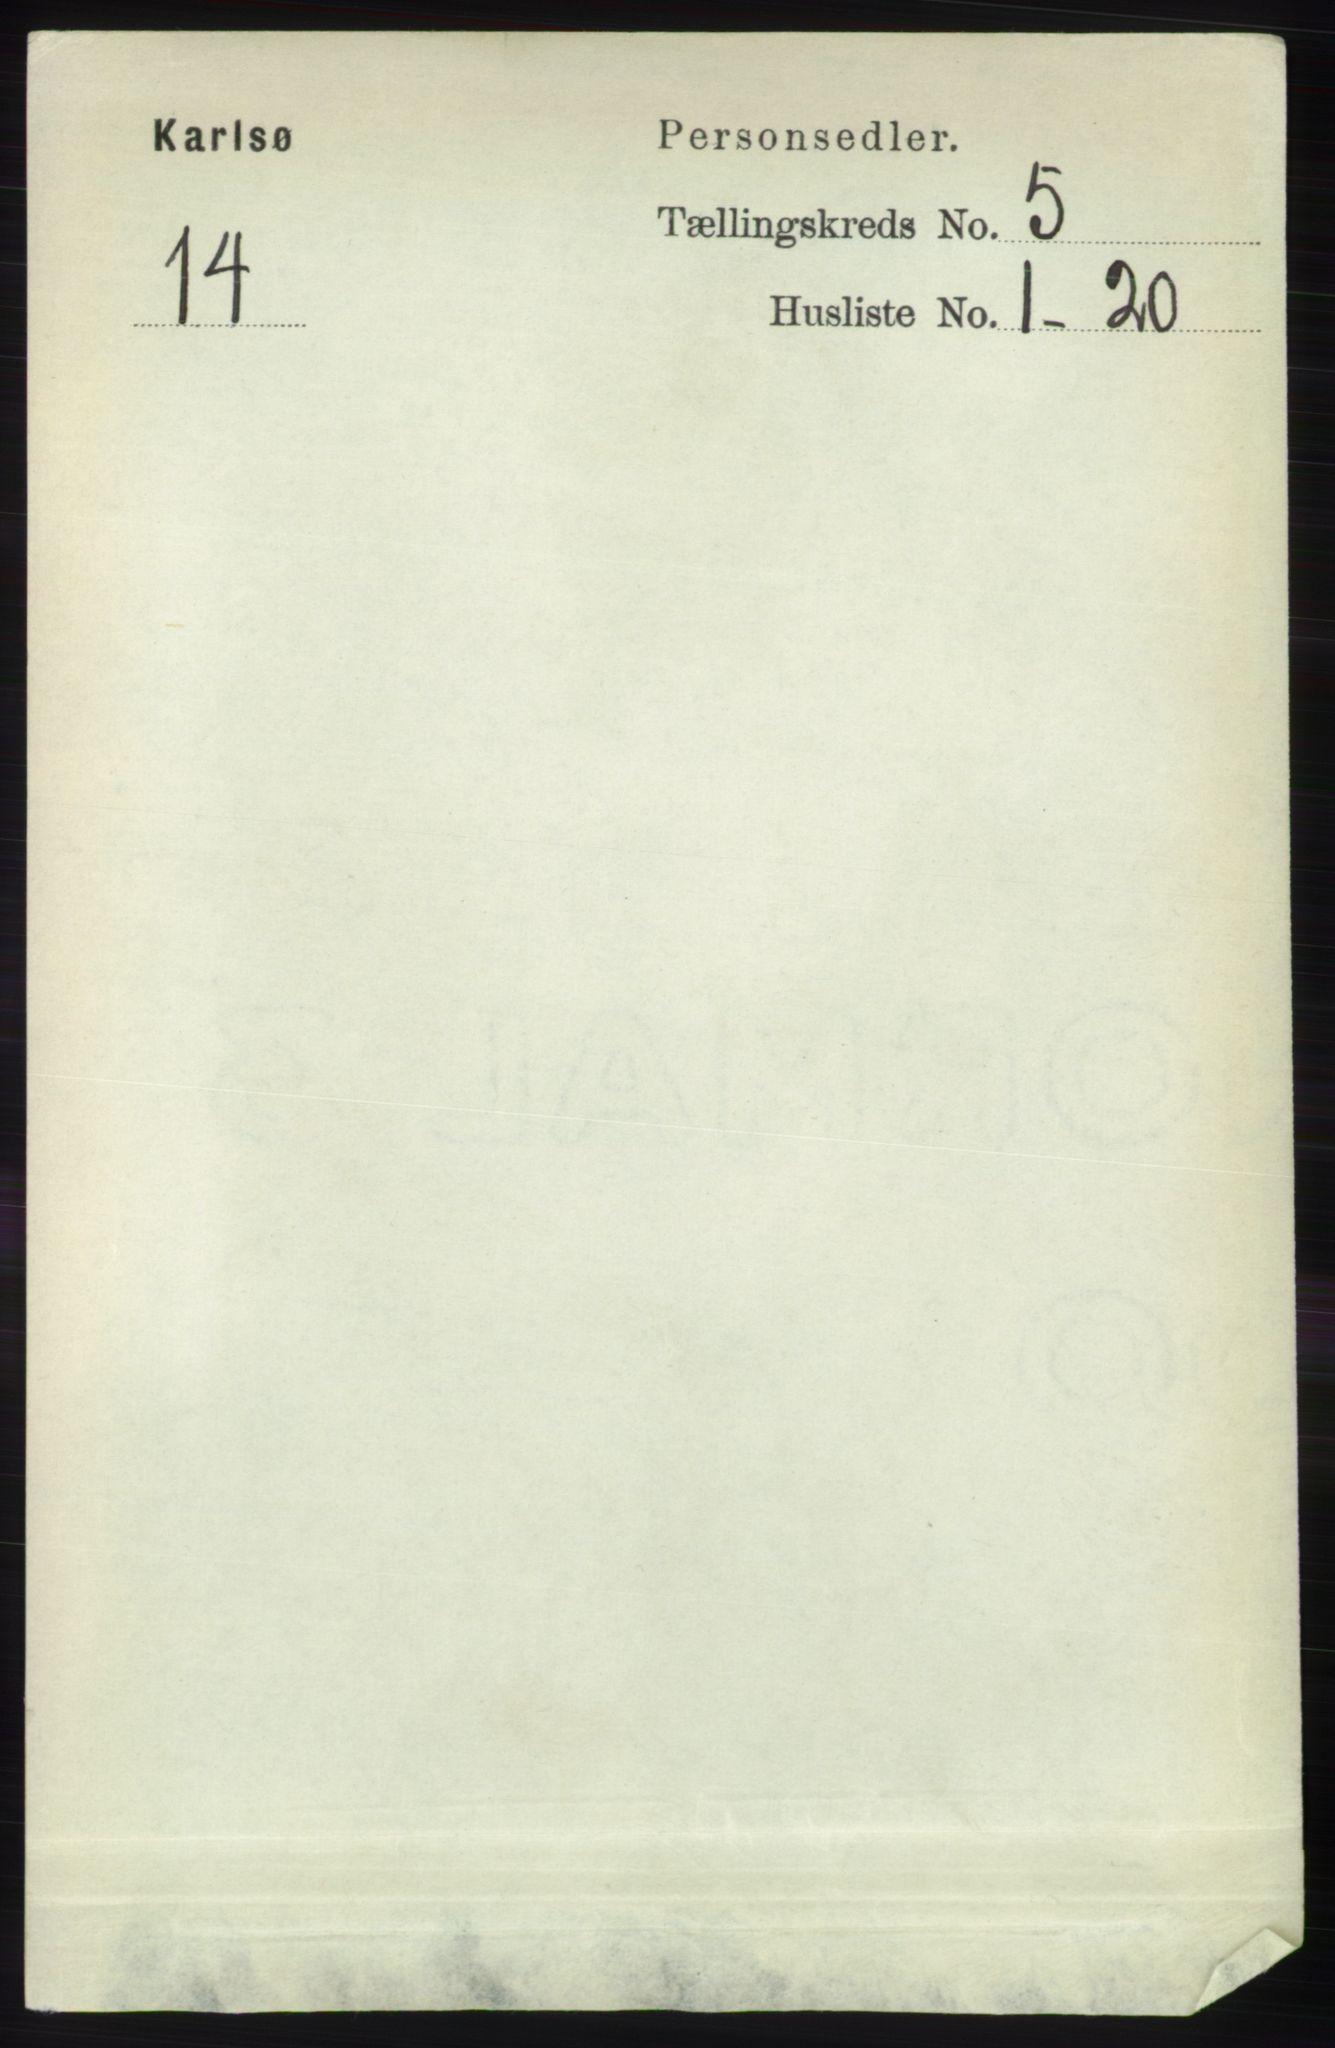 RA, Folketelling 1891 for 1936 Karlsøy herred, 1891, s. 1316